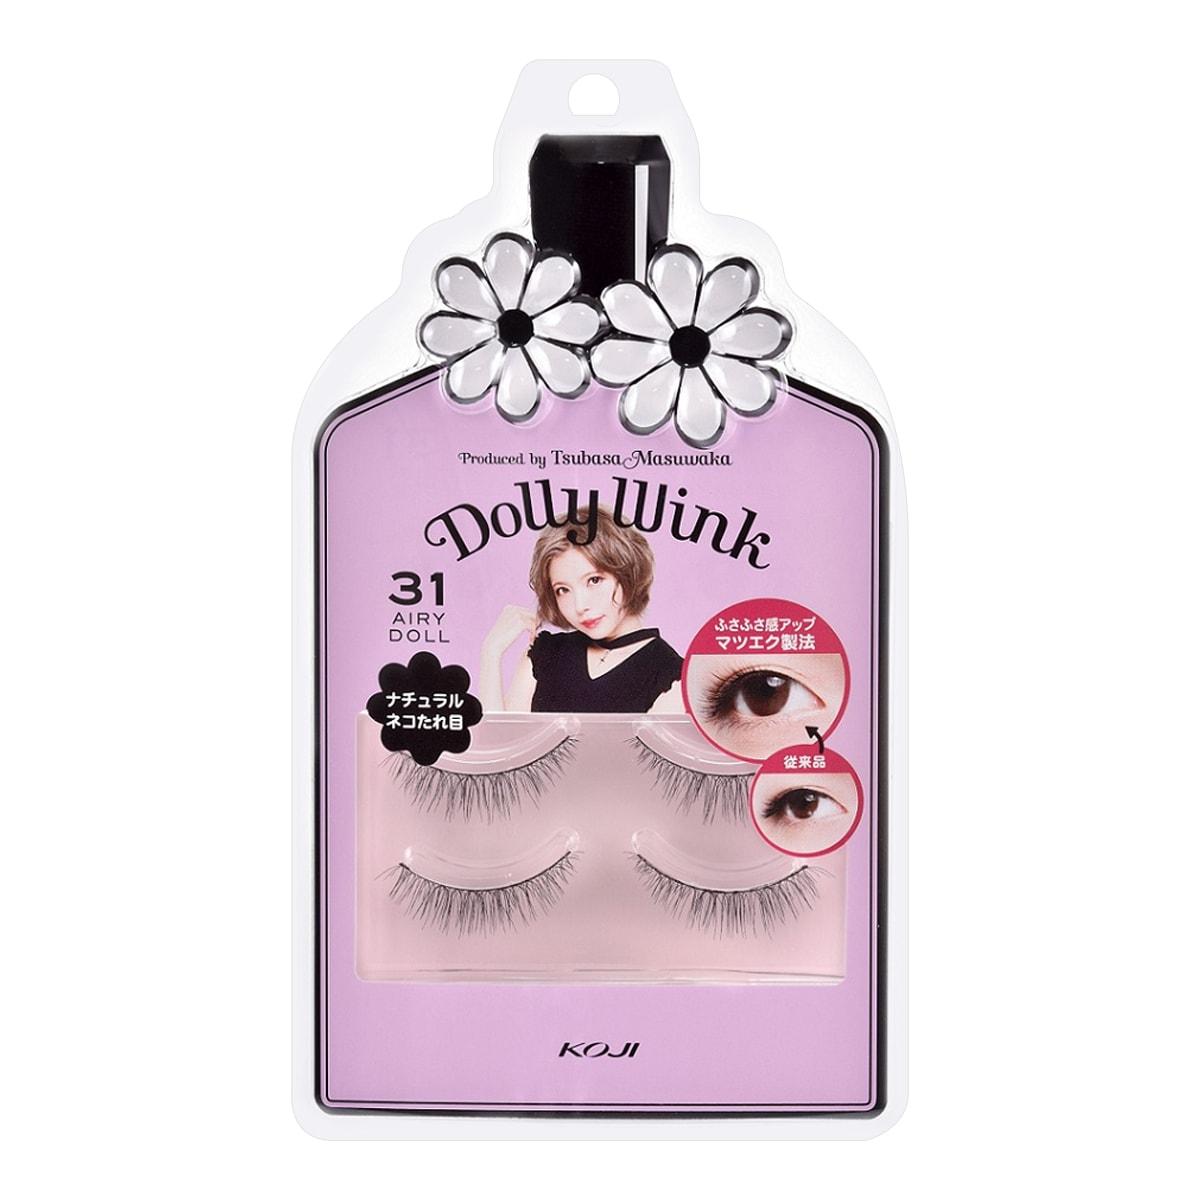 Koji Dolly Wink Series False Eyelashes Glue Included 31airy Doll